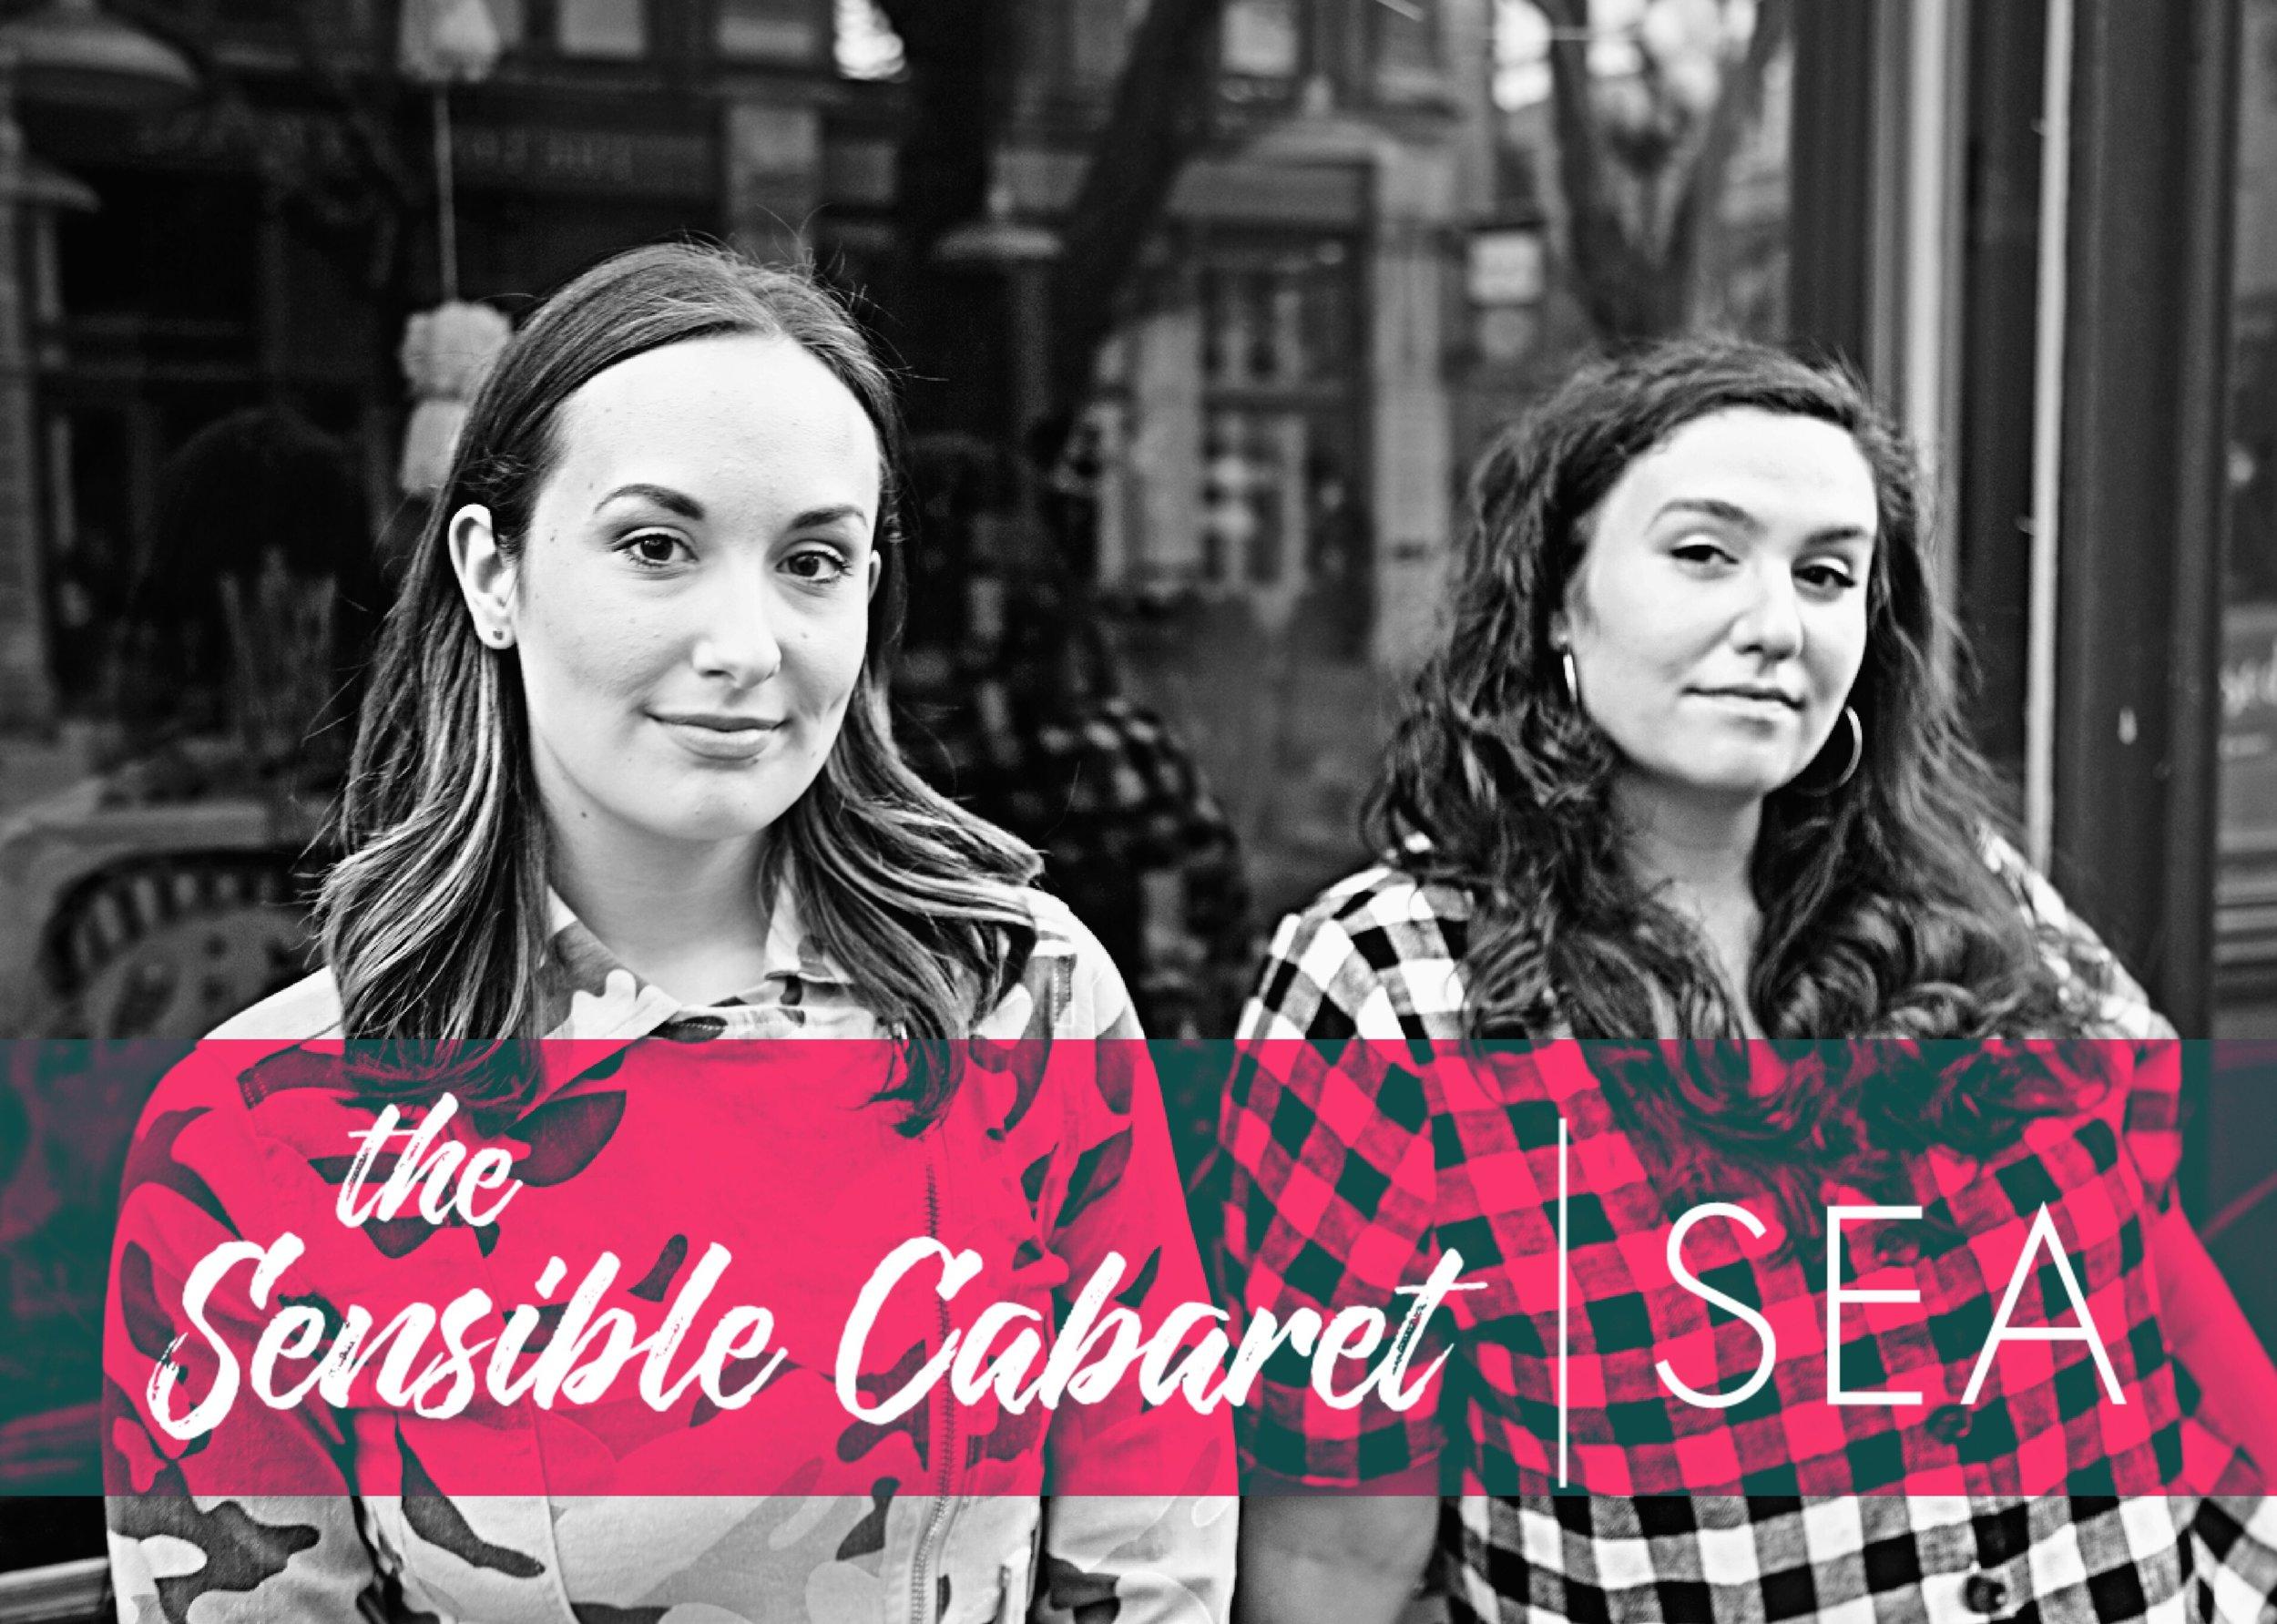 The Sensible Cabaret